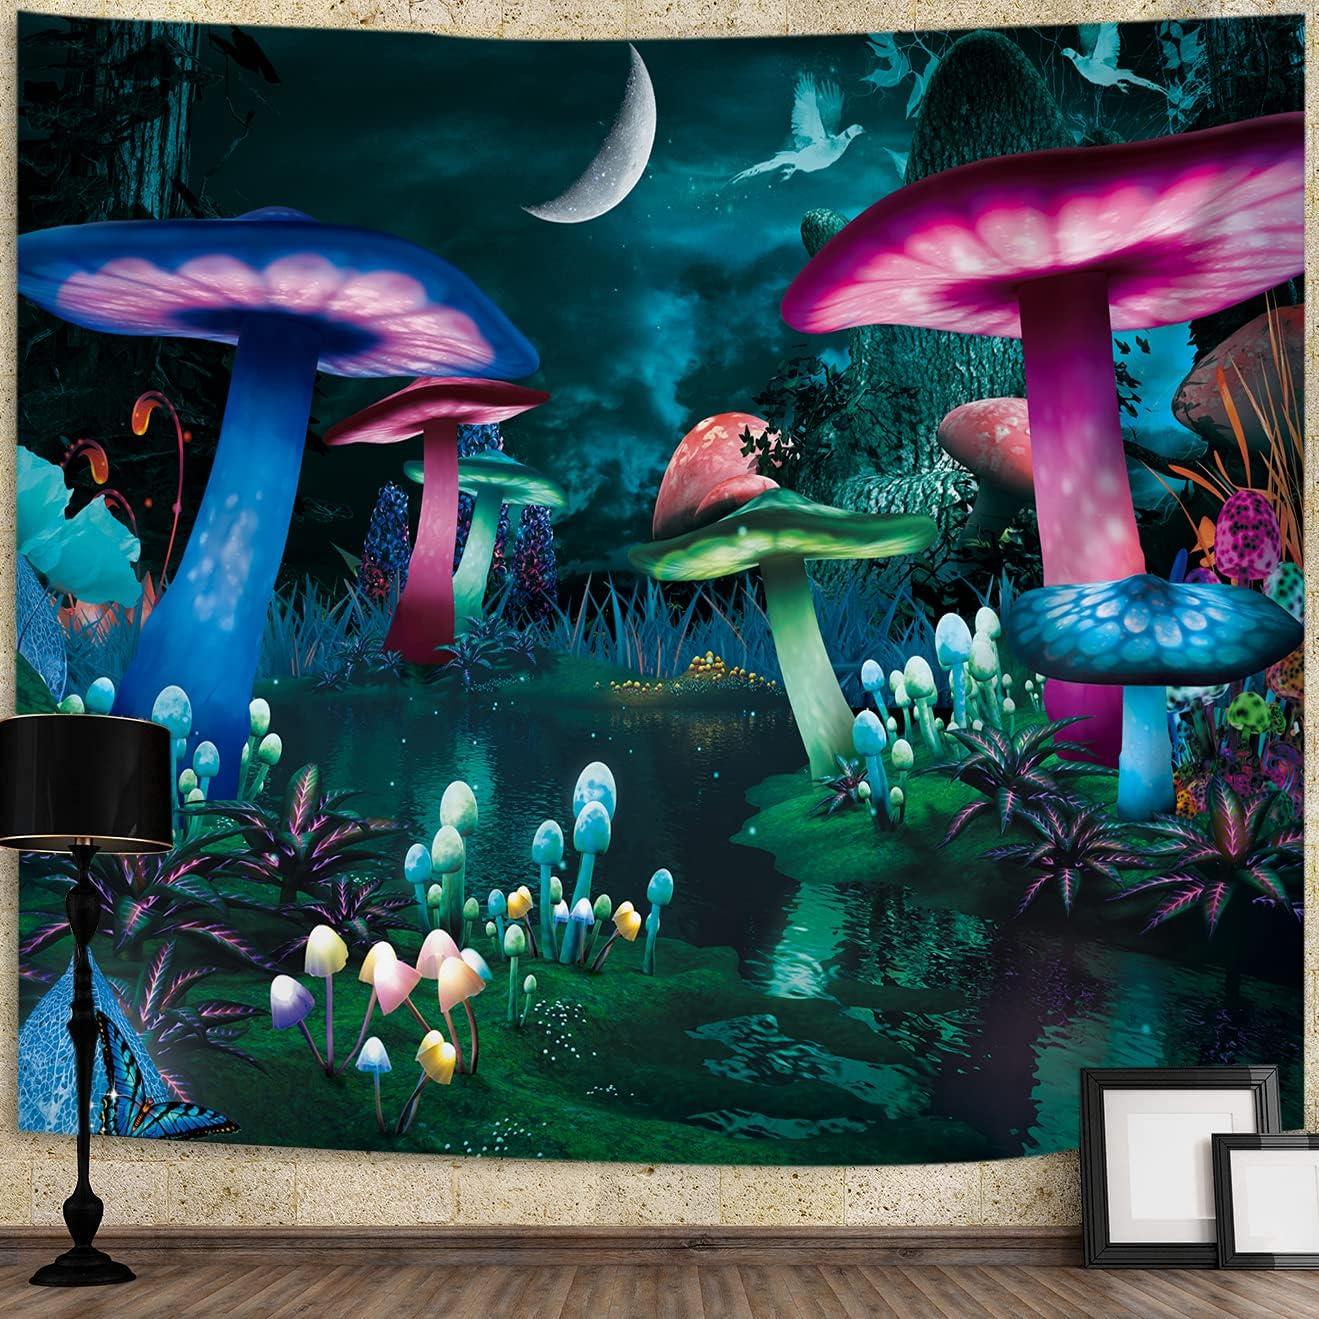 Artwove Mushroom Tapestry Psychedelic Aesthetic: Mystic Fantasy Plants Black Sky Wall Art Hanging Decor Trippy for Men Women Dorm Home Living Room Bedroom(Medium: 78.7